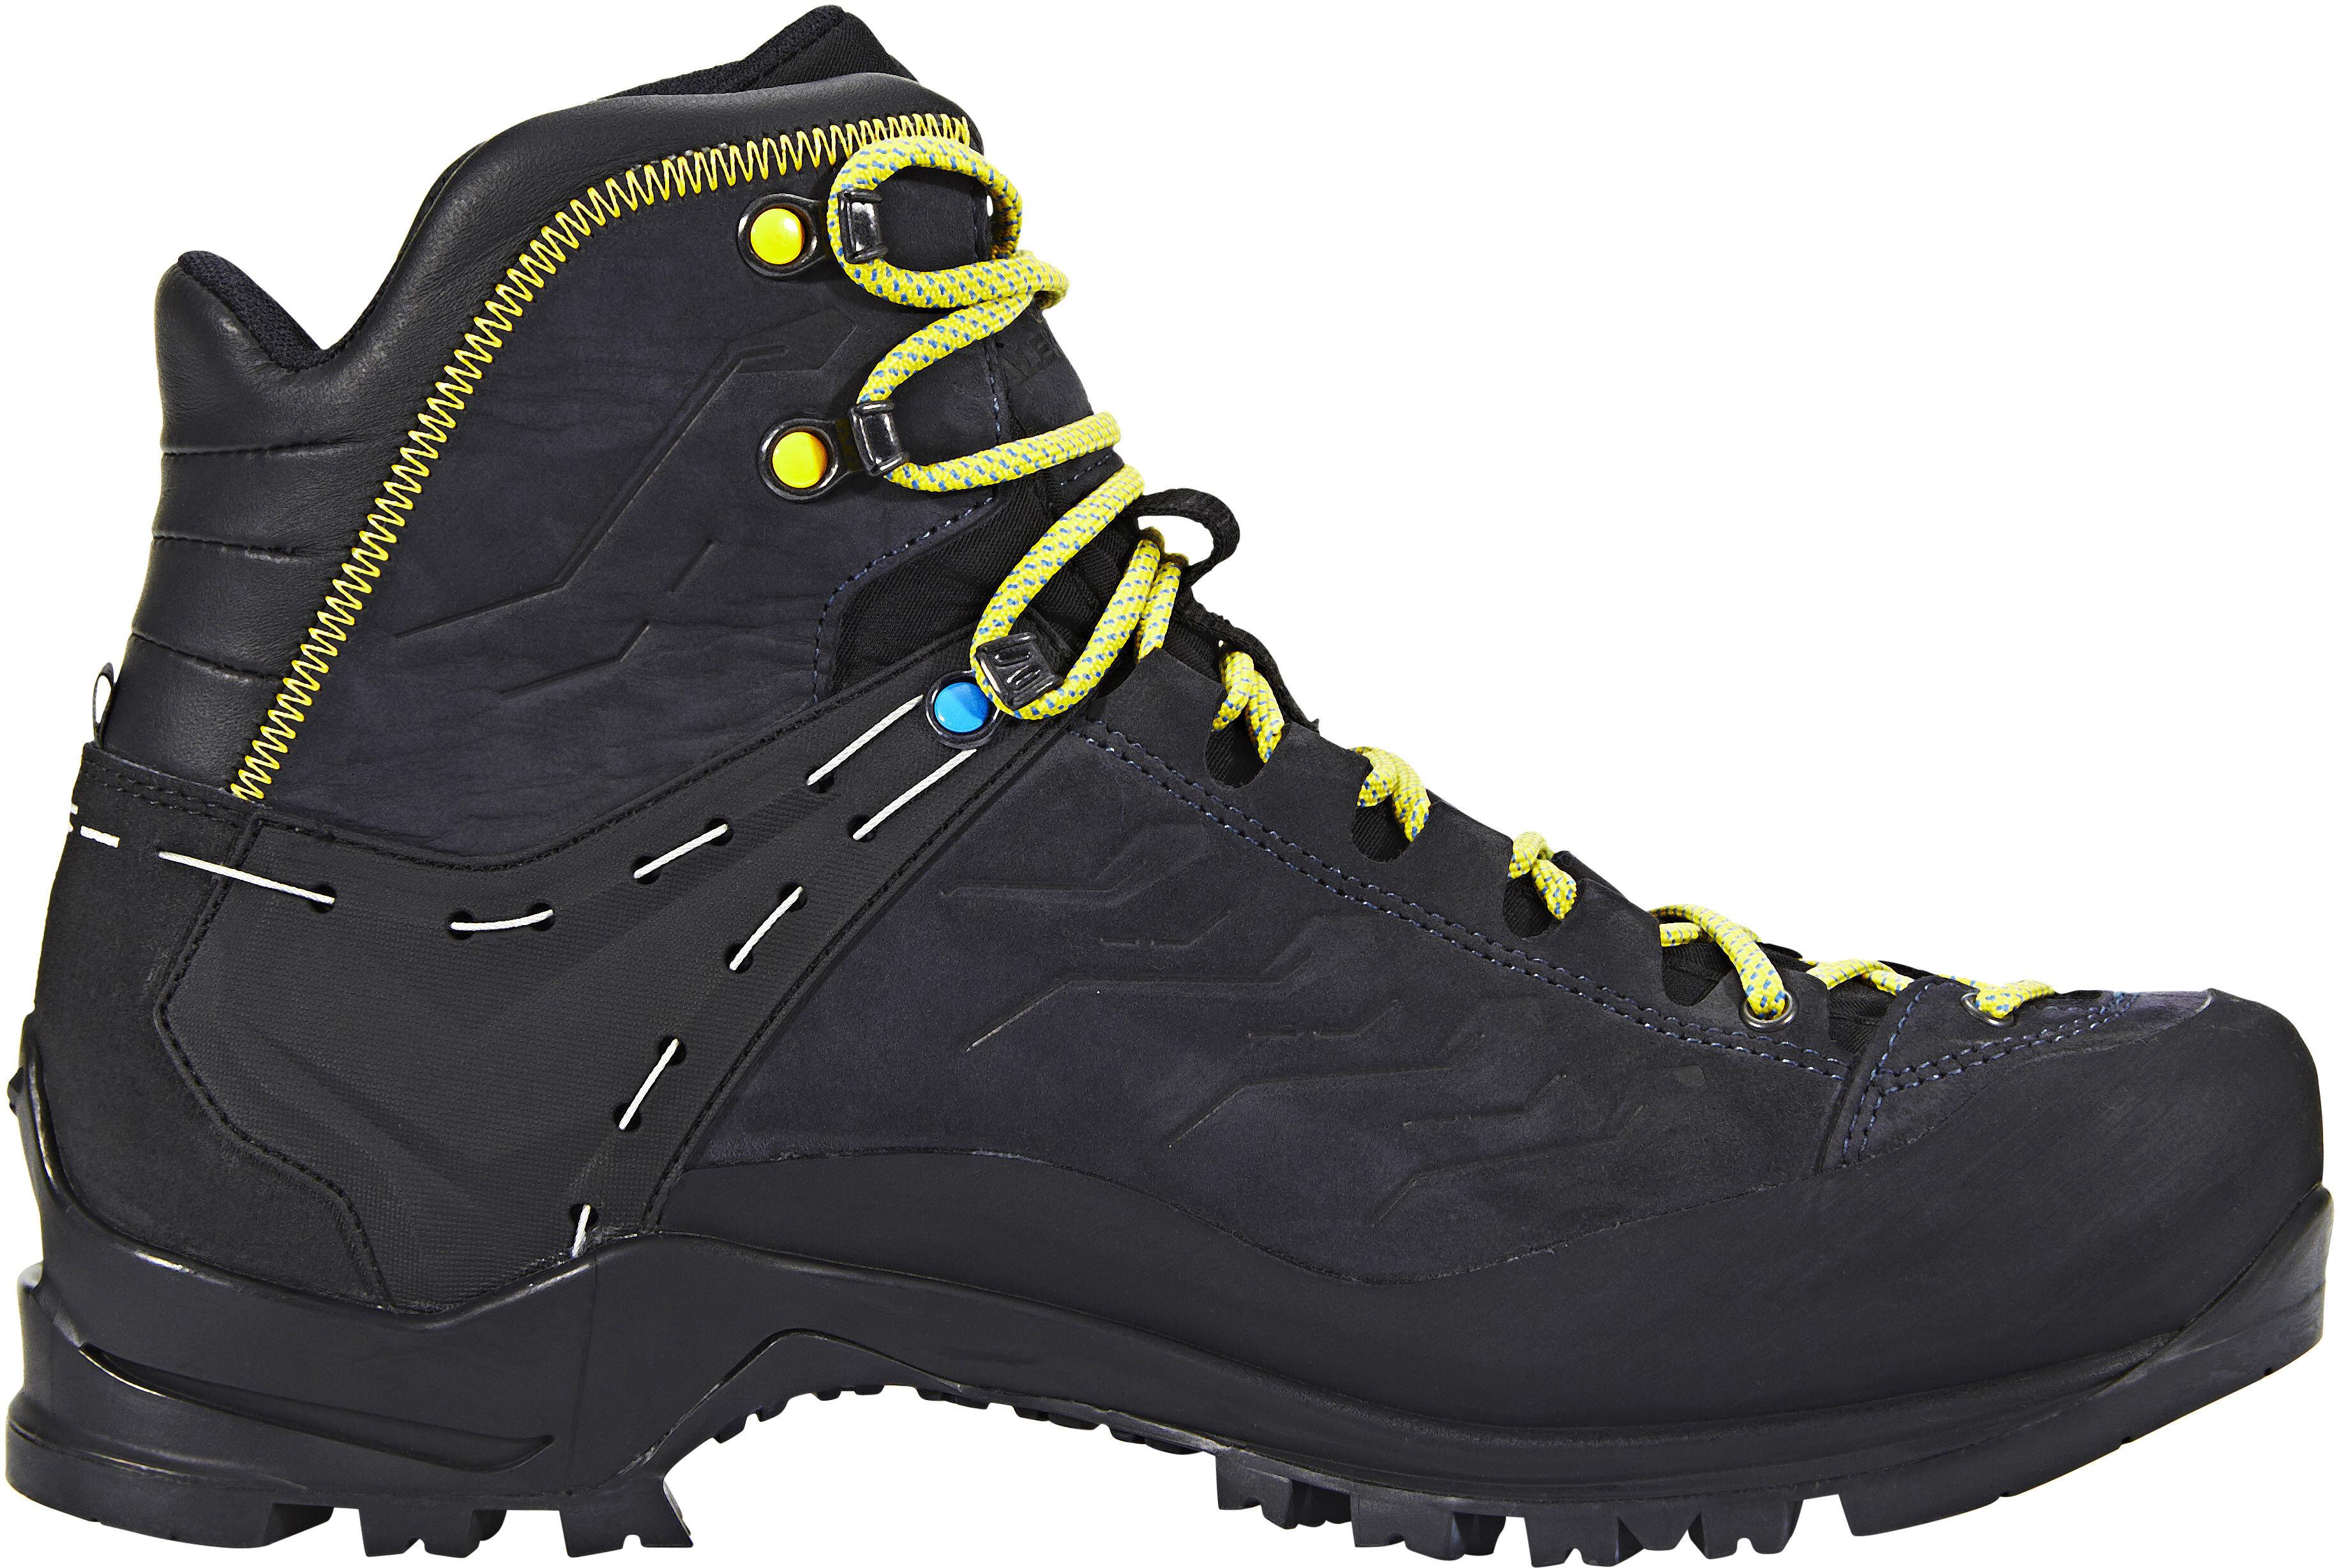 55a04fe26 Salewa Rapace GTX - Calzado Hombre - negro